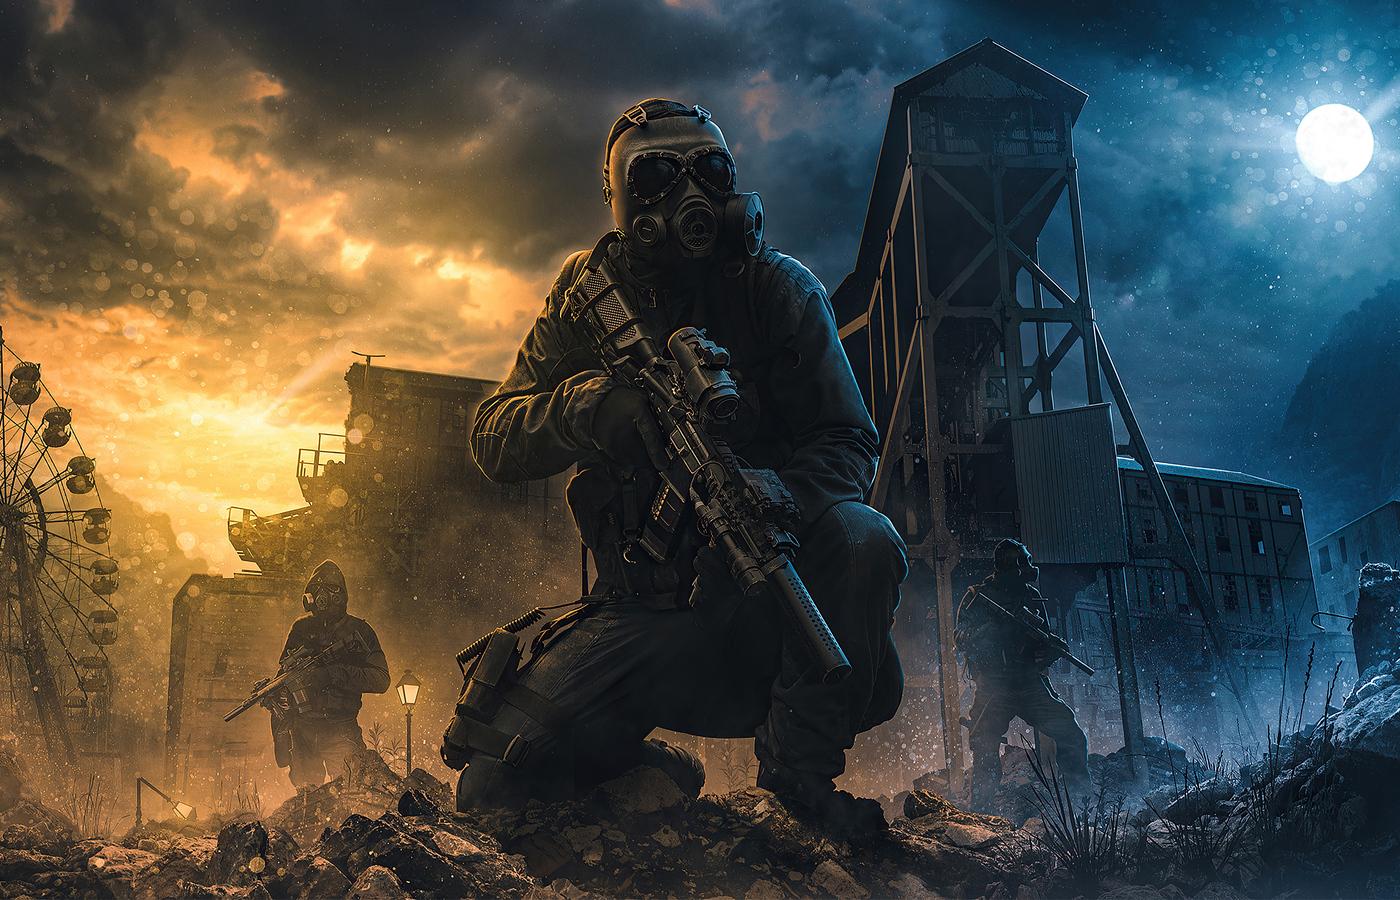 soldier-destruction-army-4k-ev-1400x900.jpg